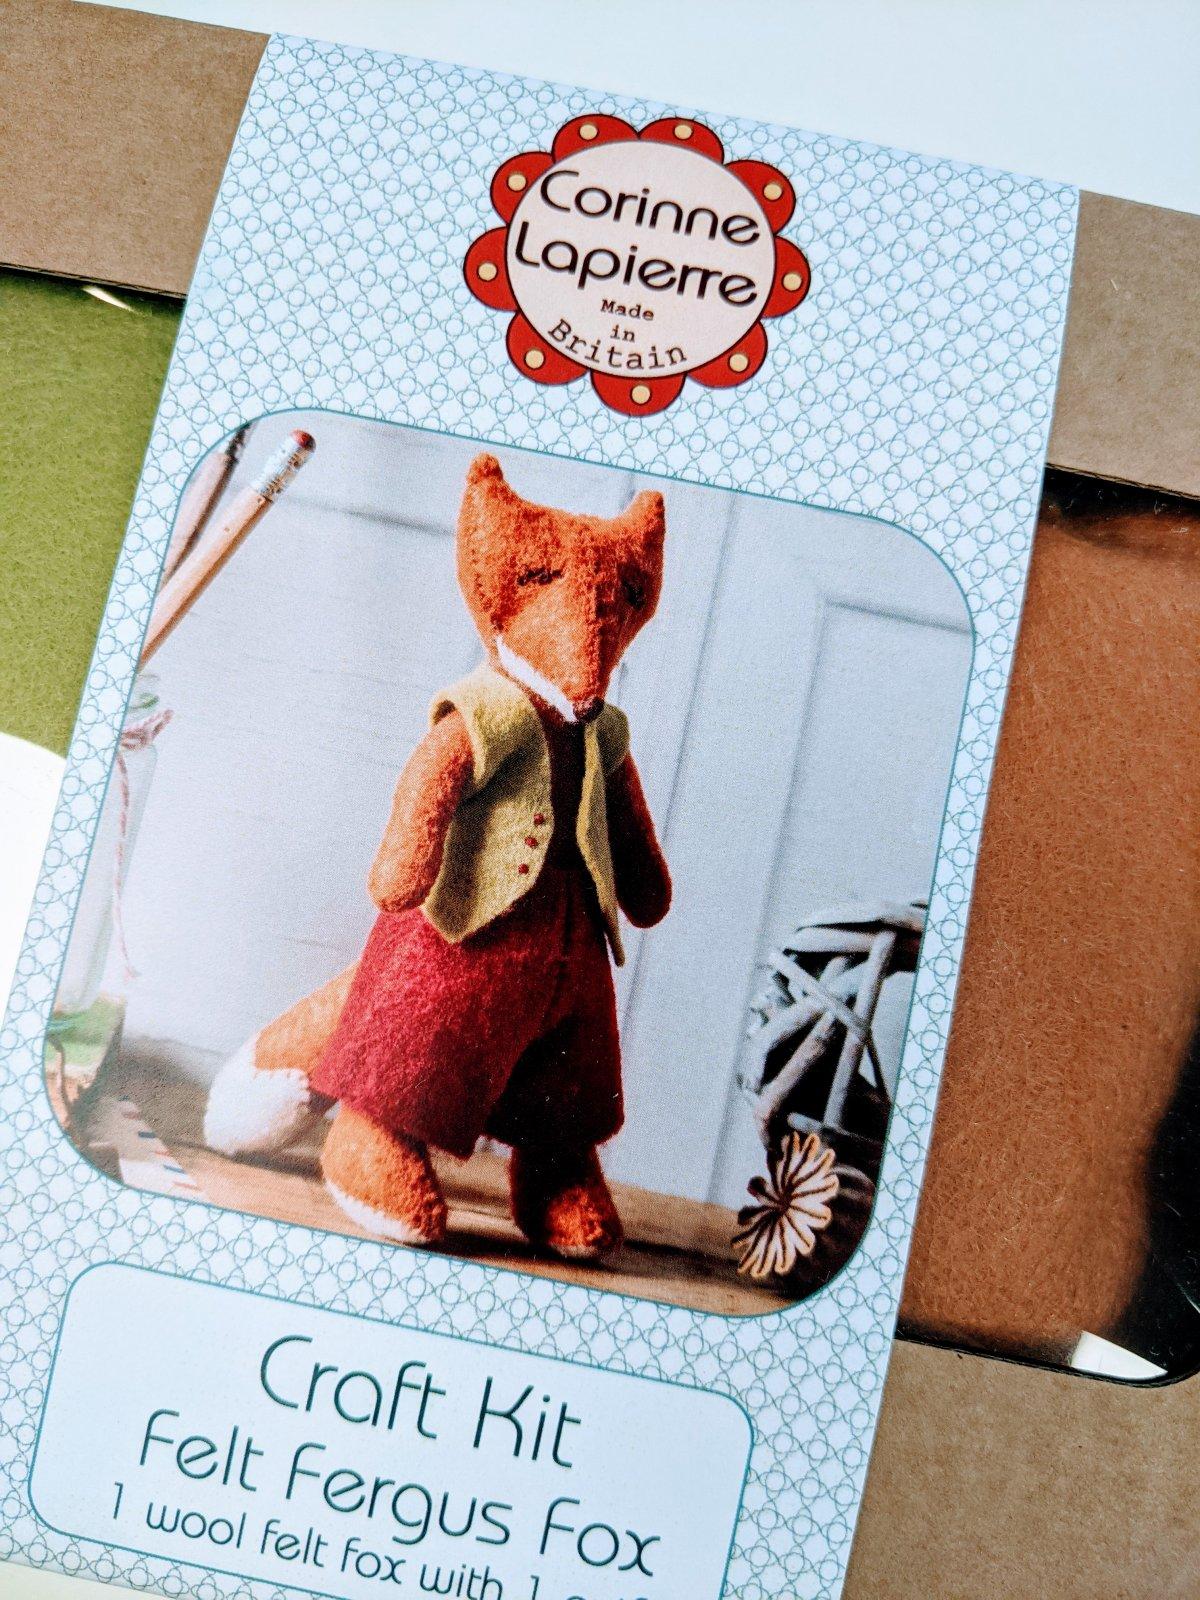 Fergus Fox Felt Kit by Corinne Lapierre